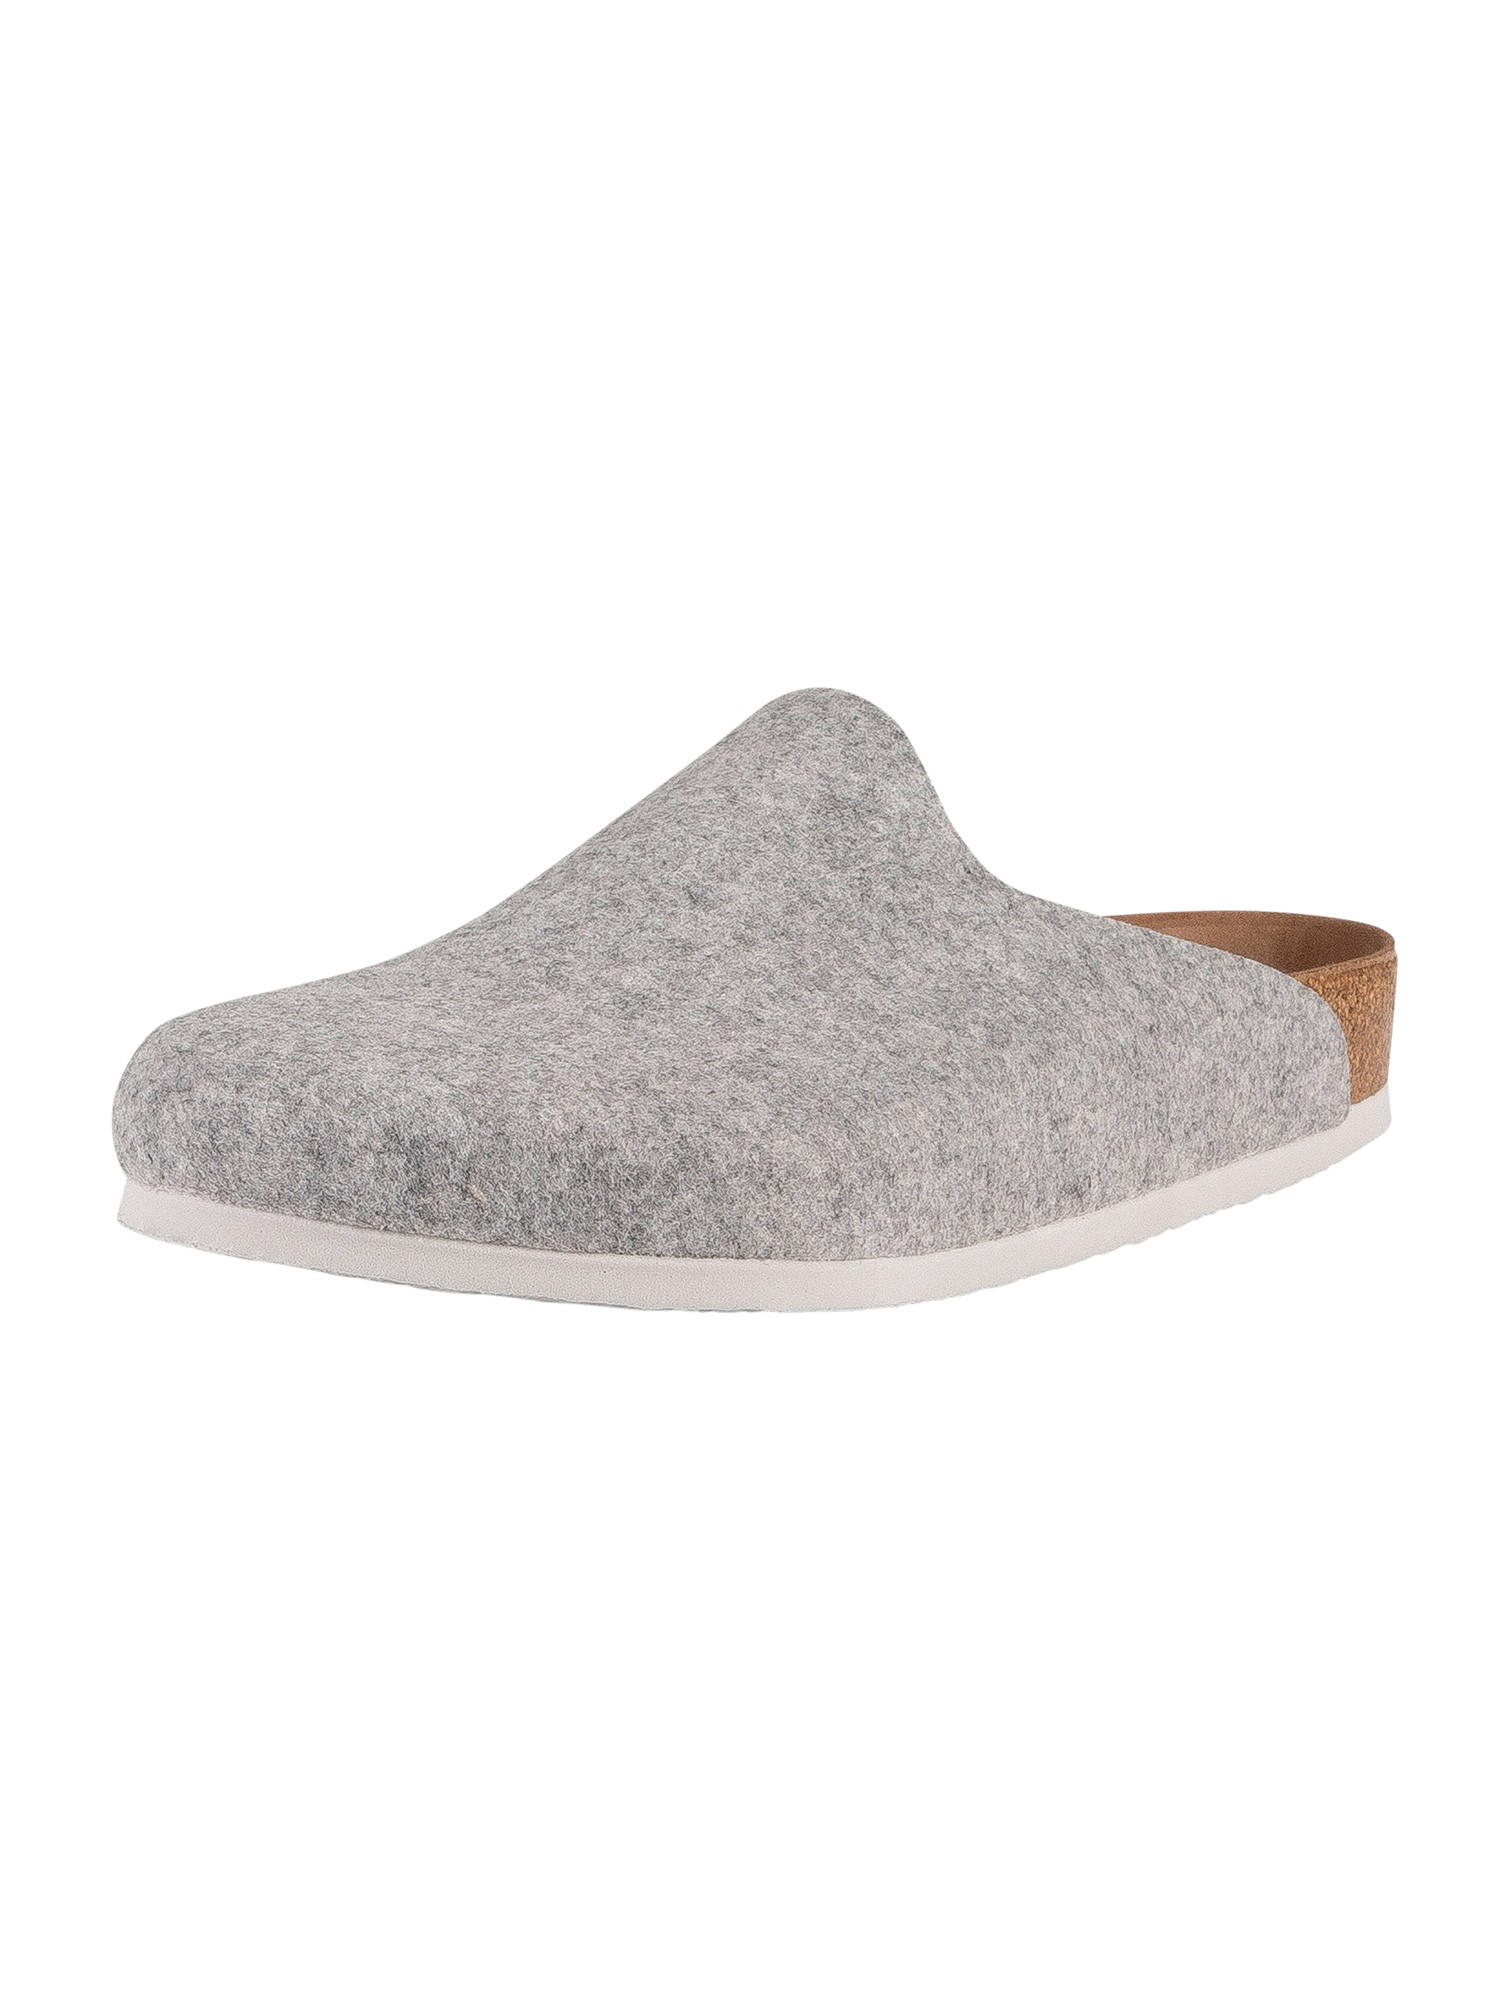 Amsterdam-Vegan-Slippers